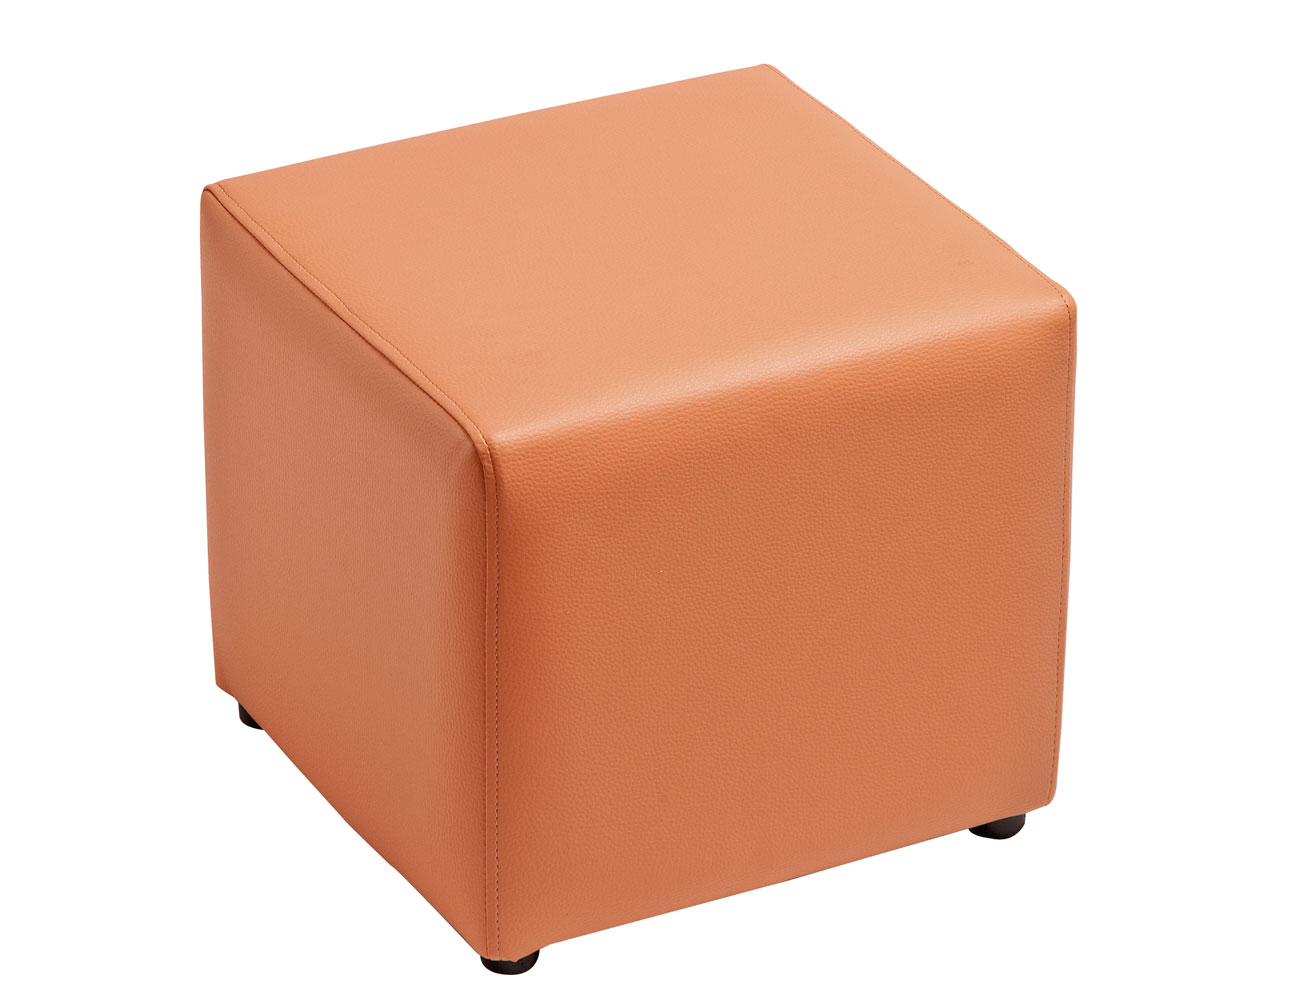 4 cuadrado fijo naranja4